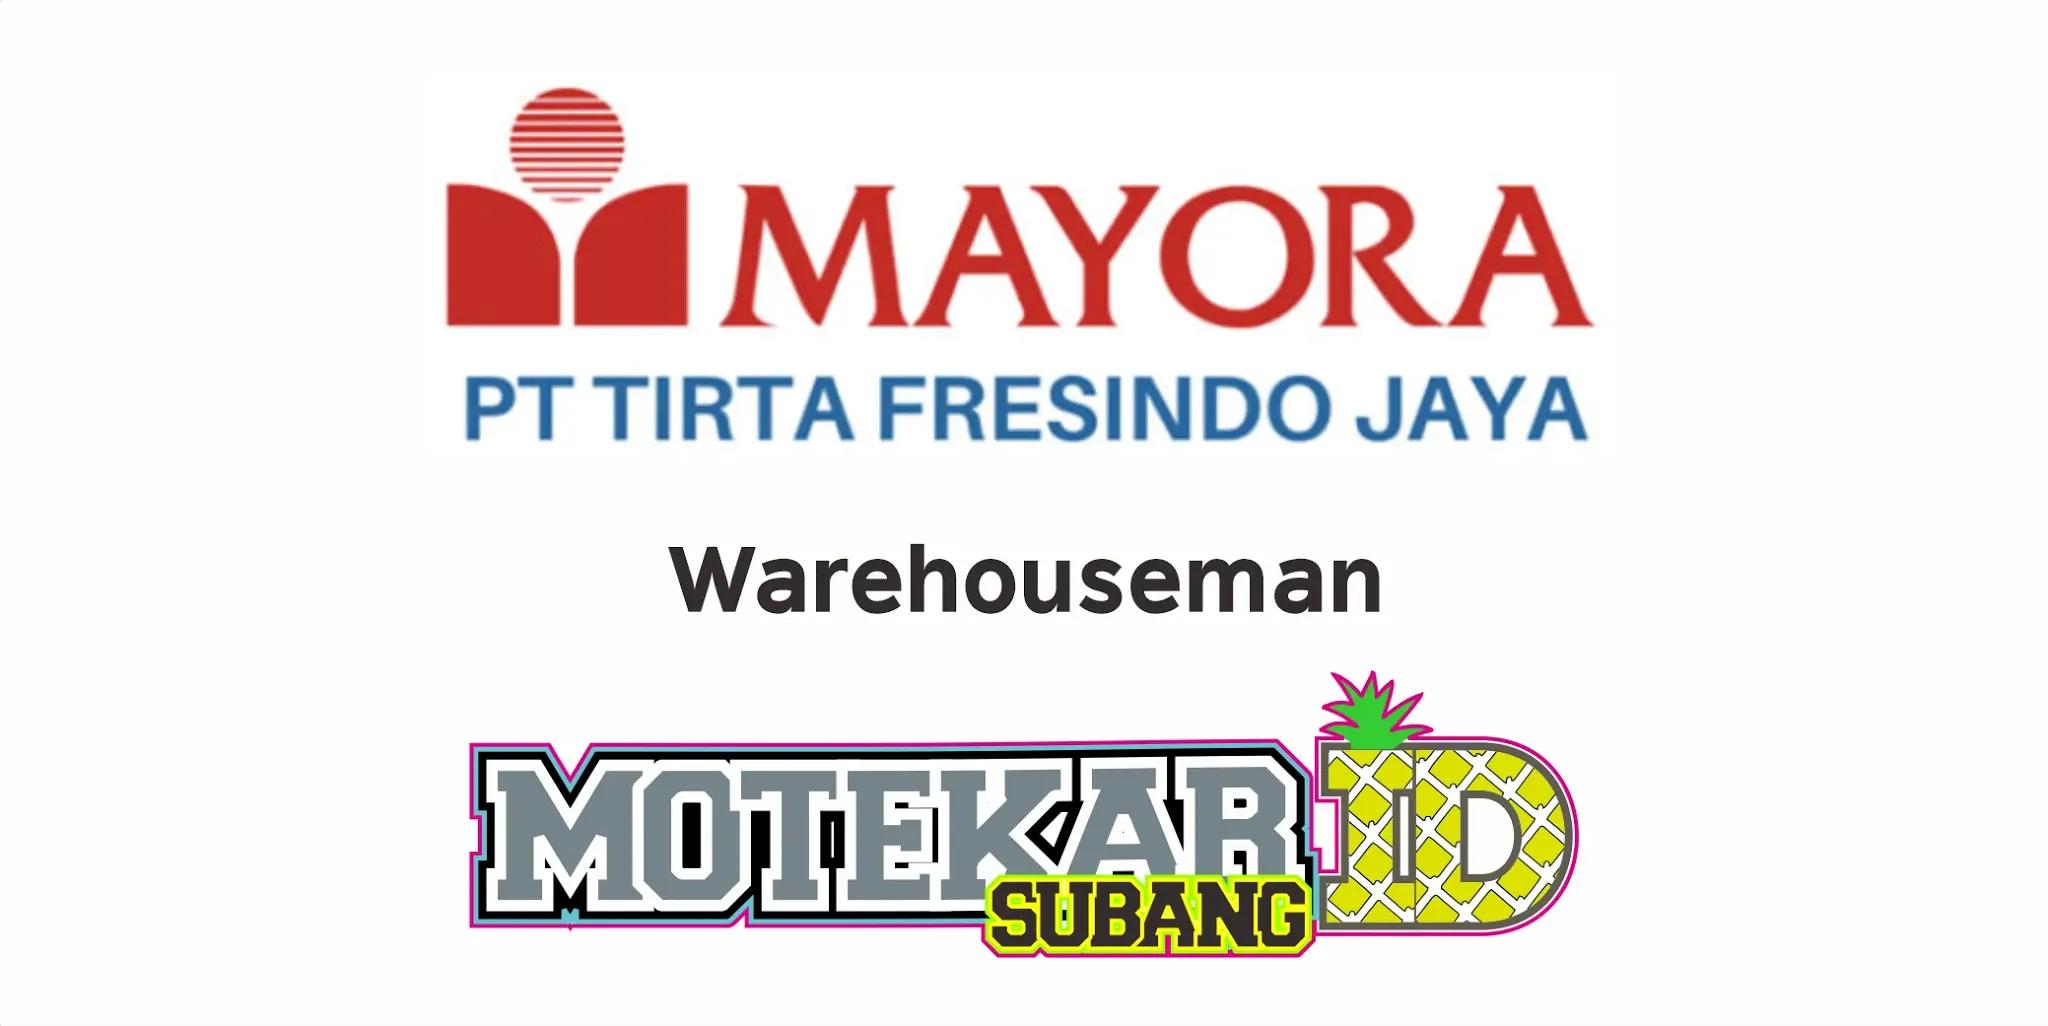 Lowongan Kerja Pt Tirta Fresindo Jaya Januari 2021 Motekar Subang